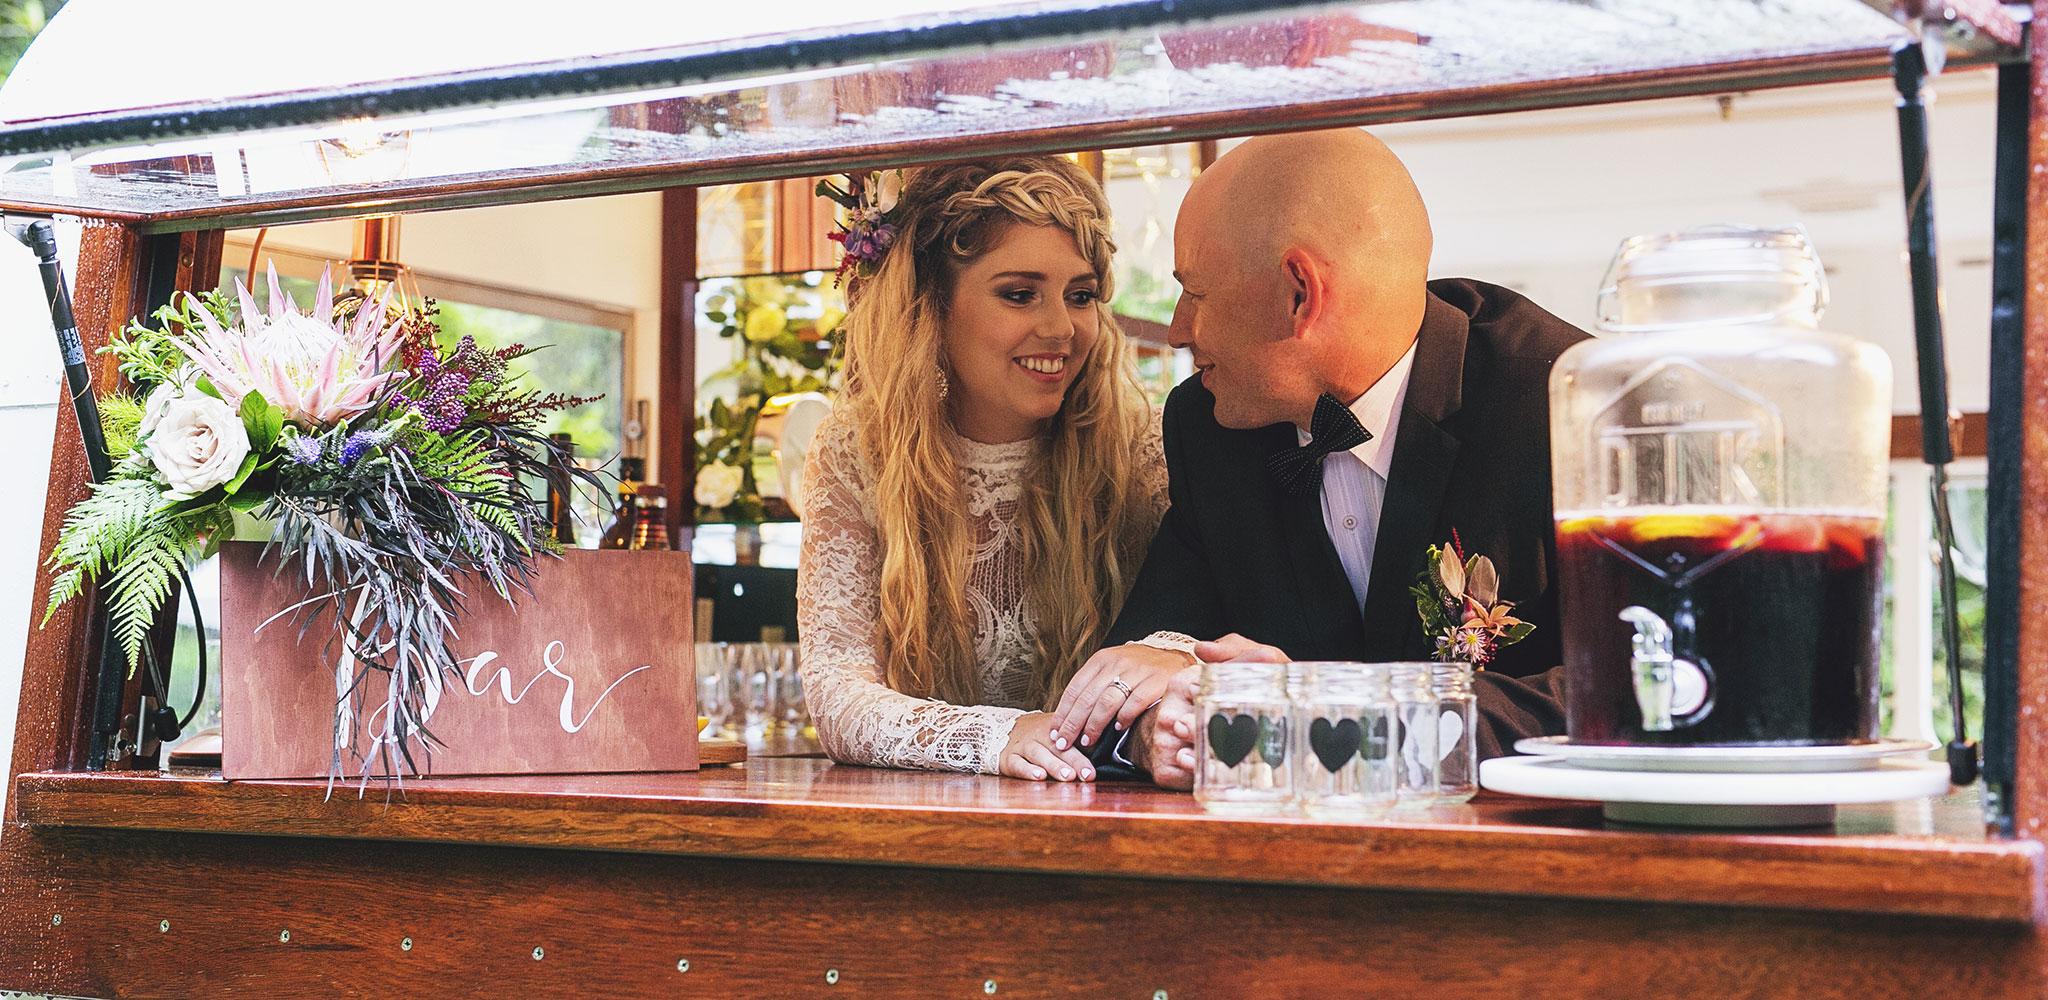 wedding-bride-groom-bar-caravan